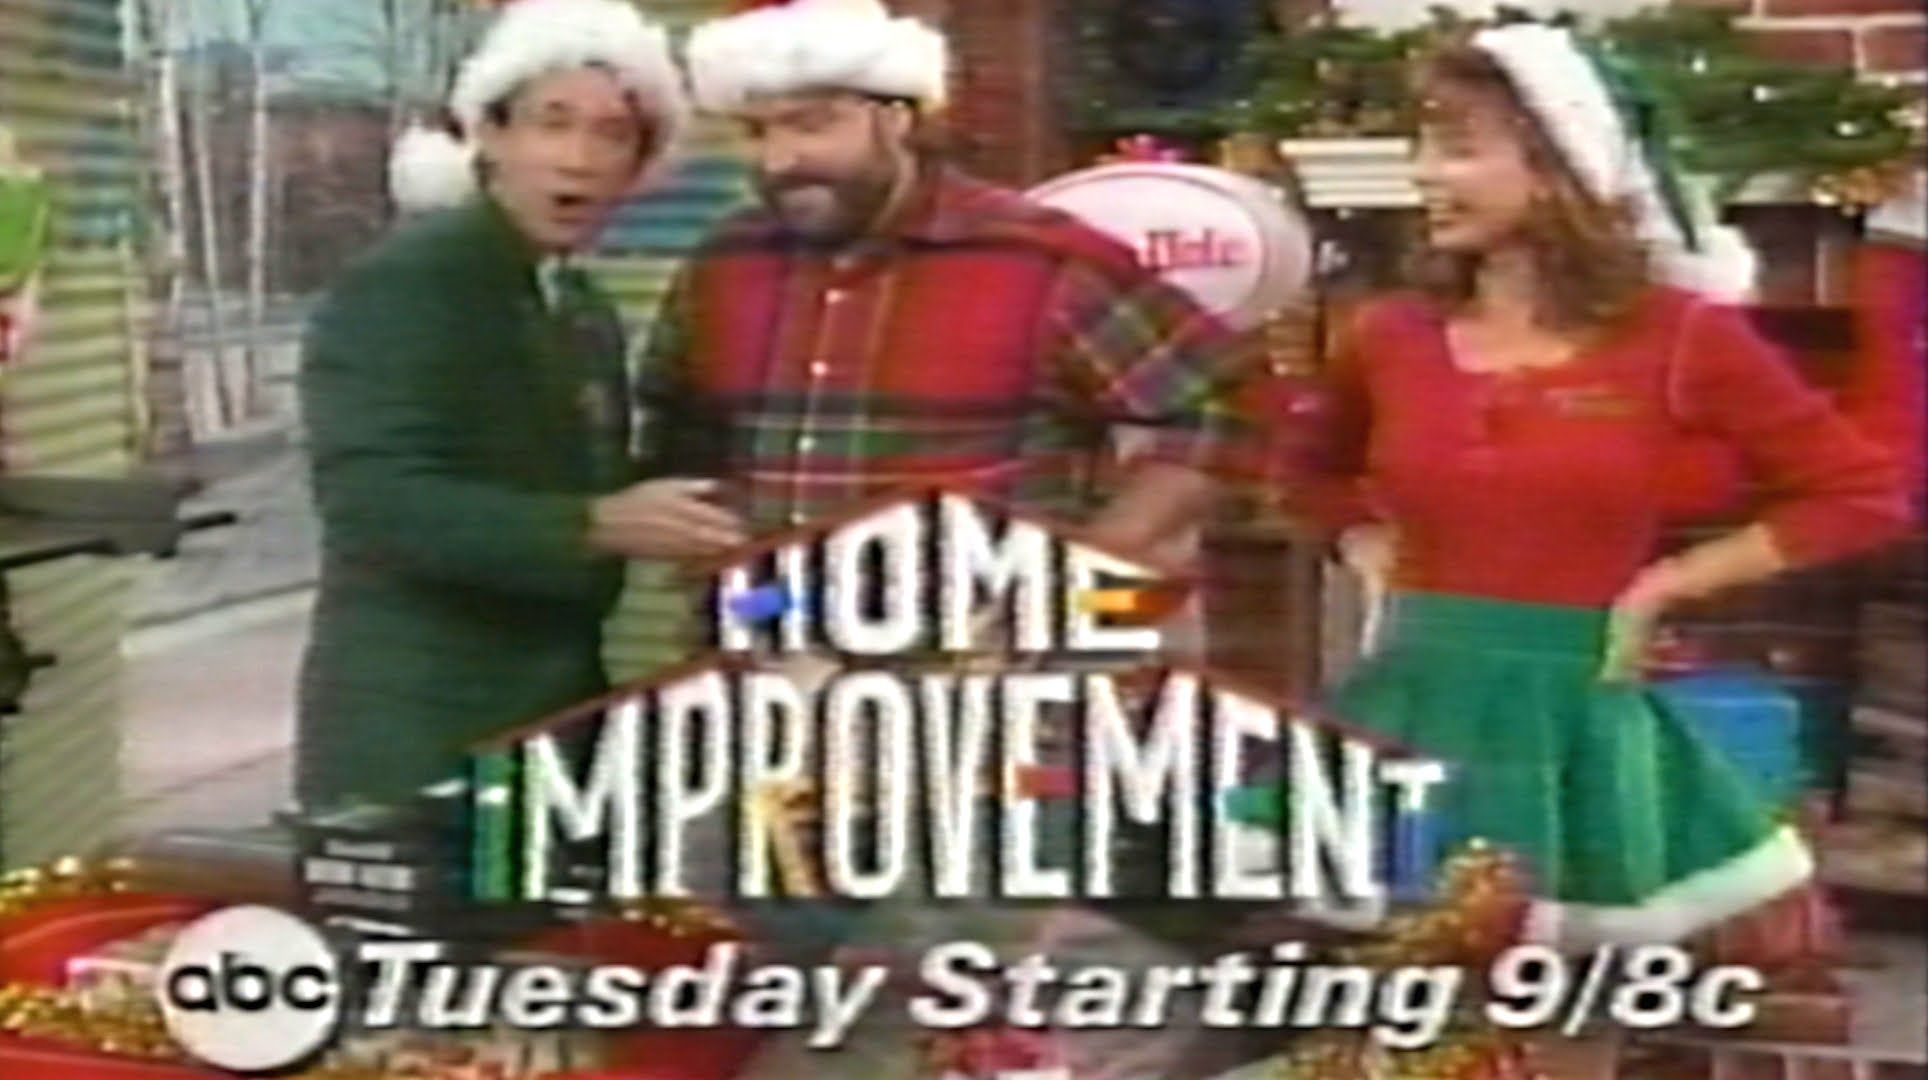 1994 Promo Home Improvement Christmas Episode Tuesday 9pm C On Abc Christmas Episodes Abc Home Improvement